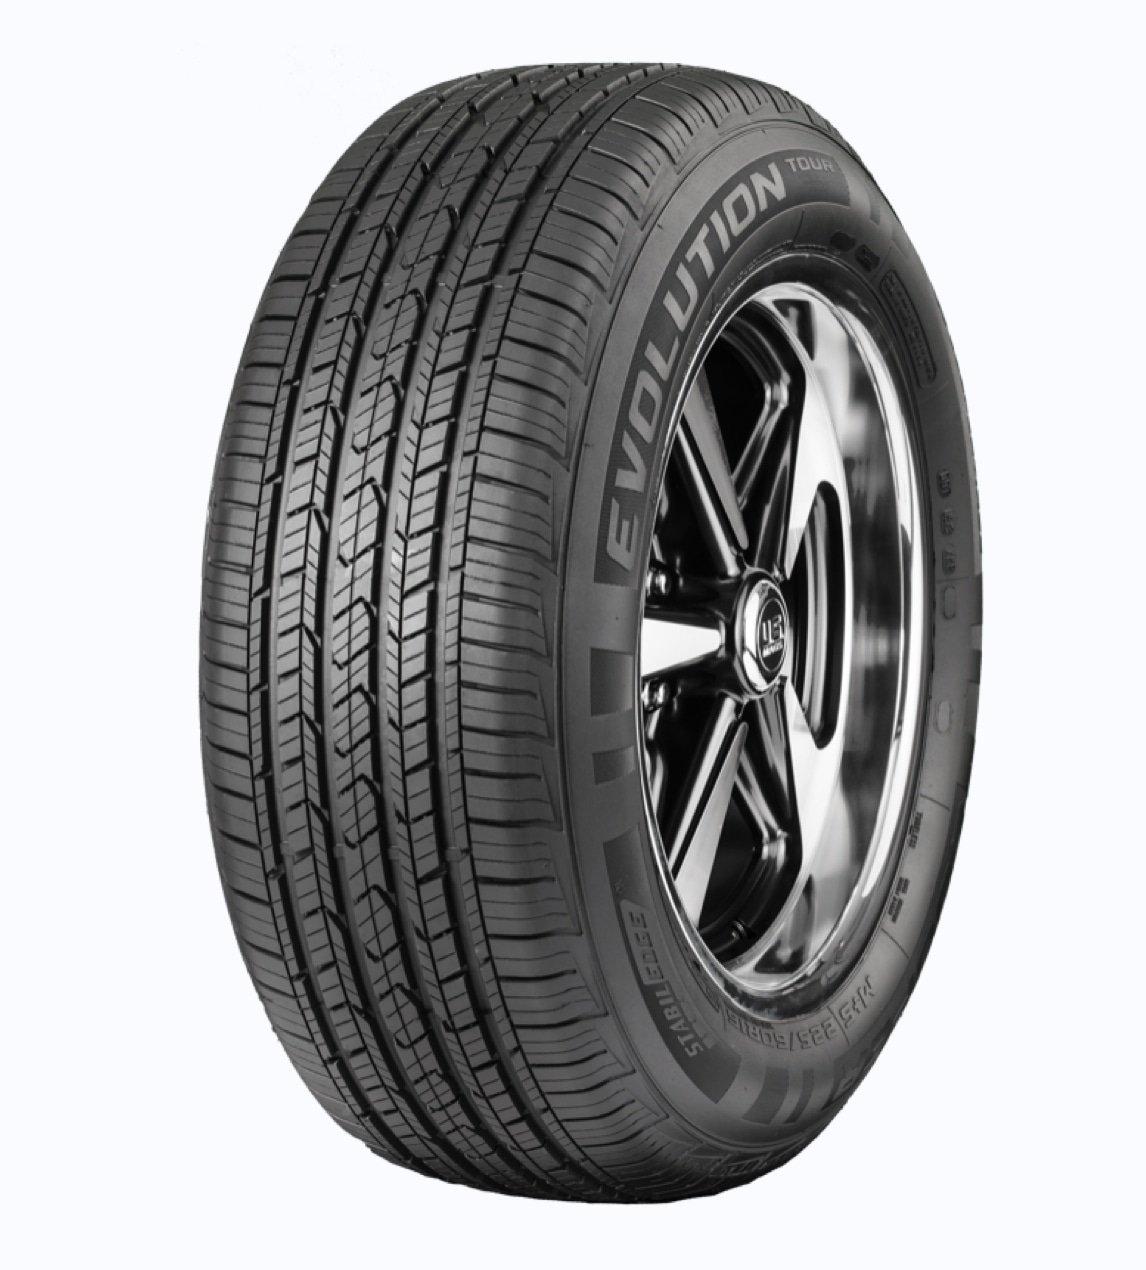 Set of 2 Cooper Evolution Tour 225/55R17 97H tires  BRAND NEW